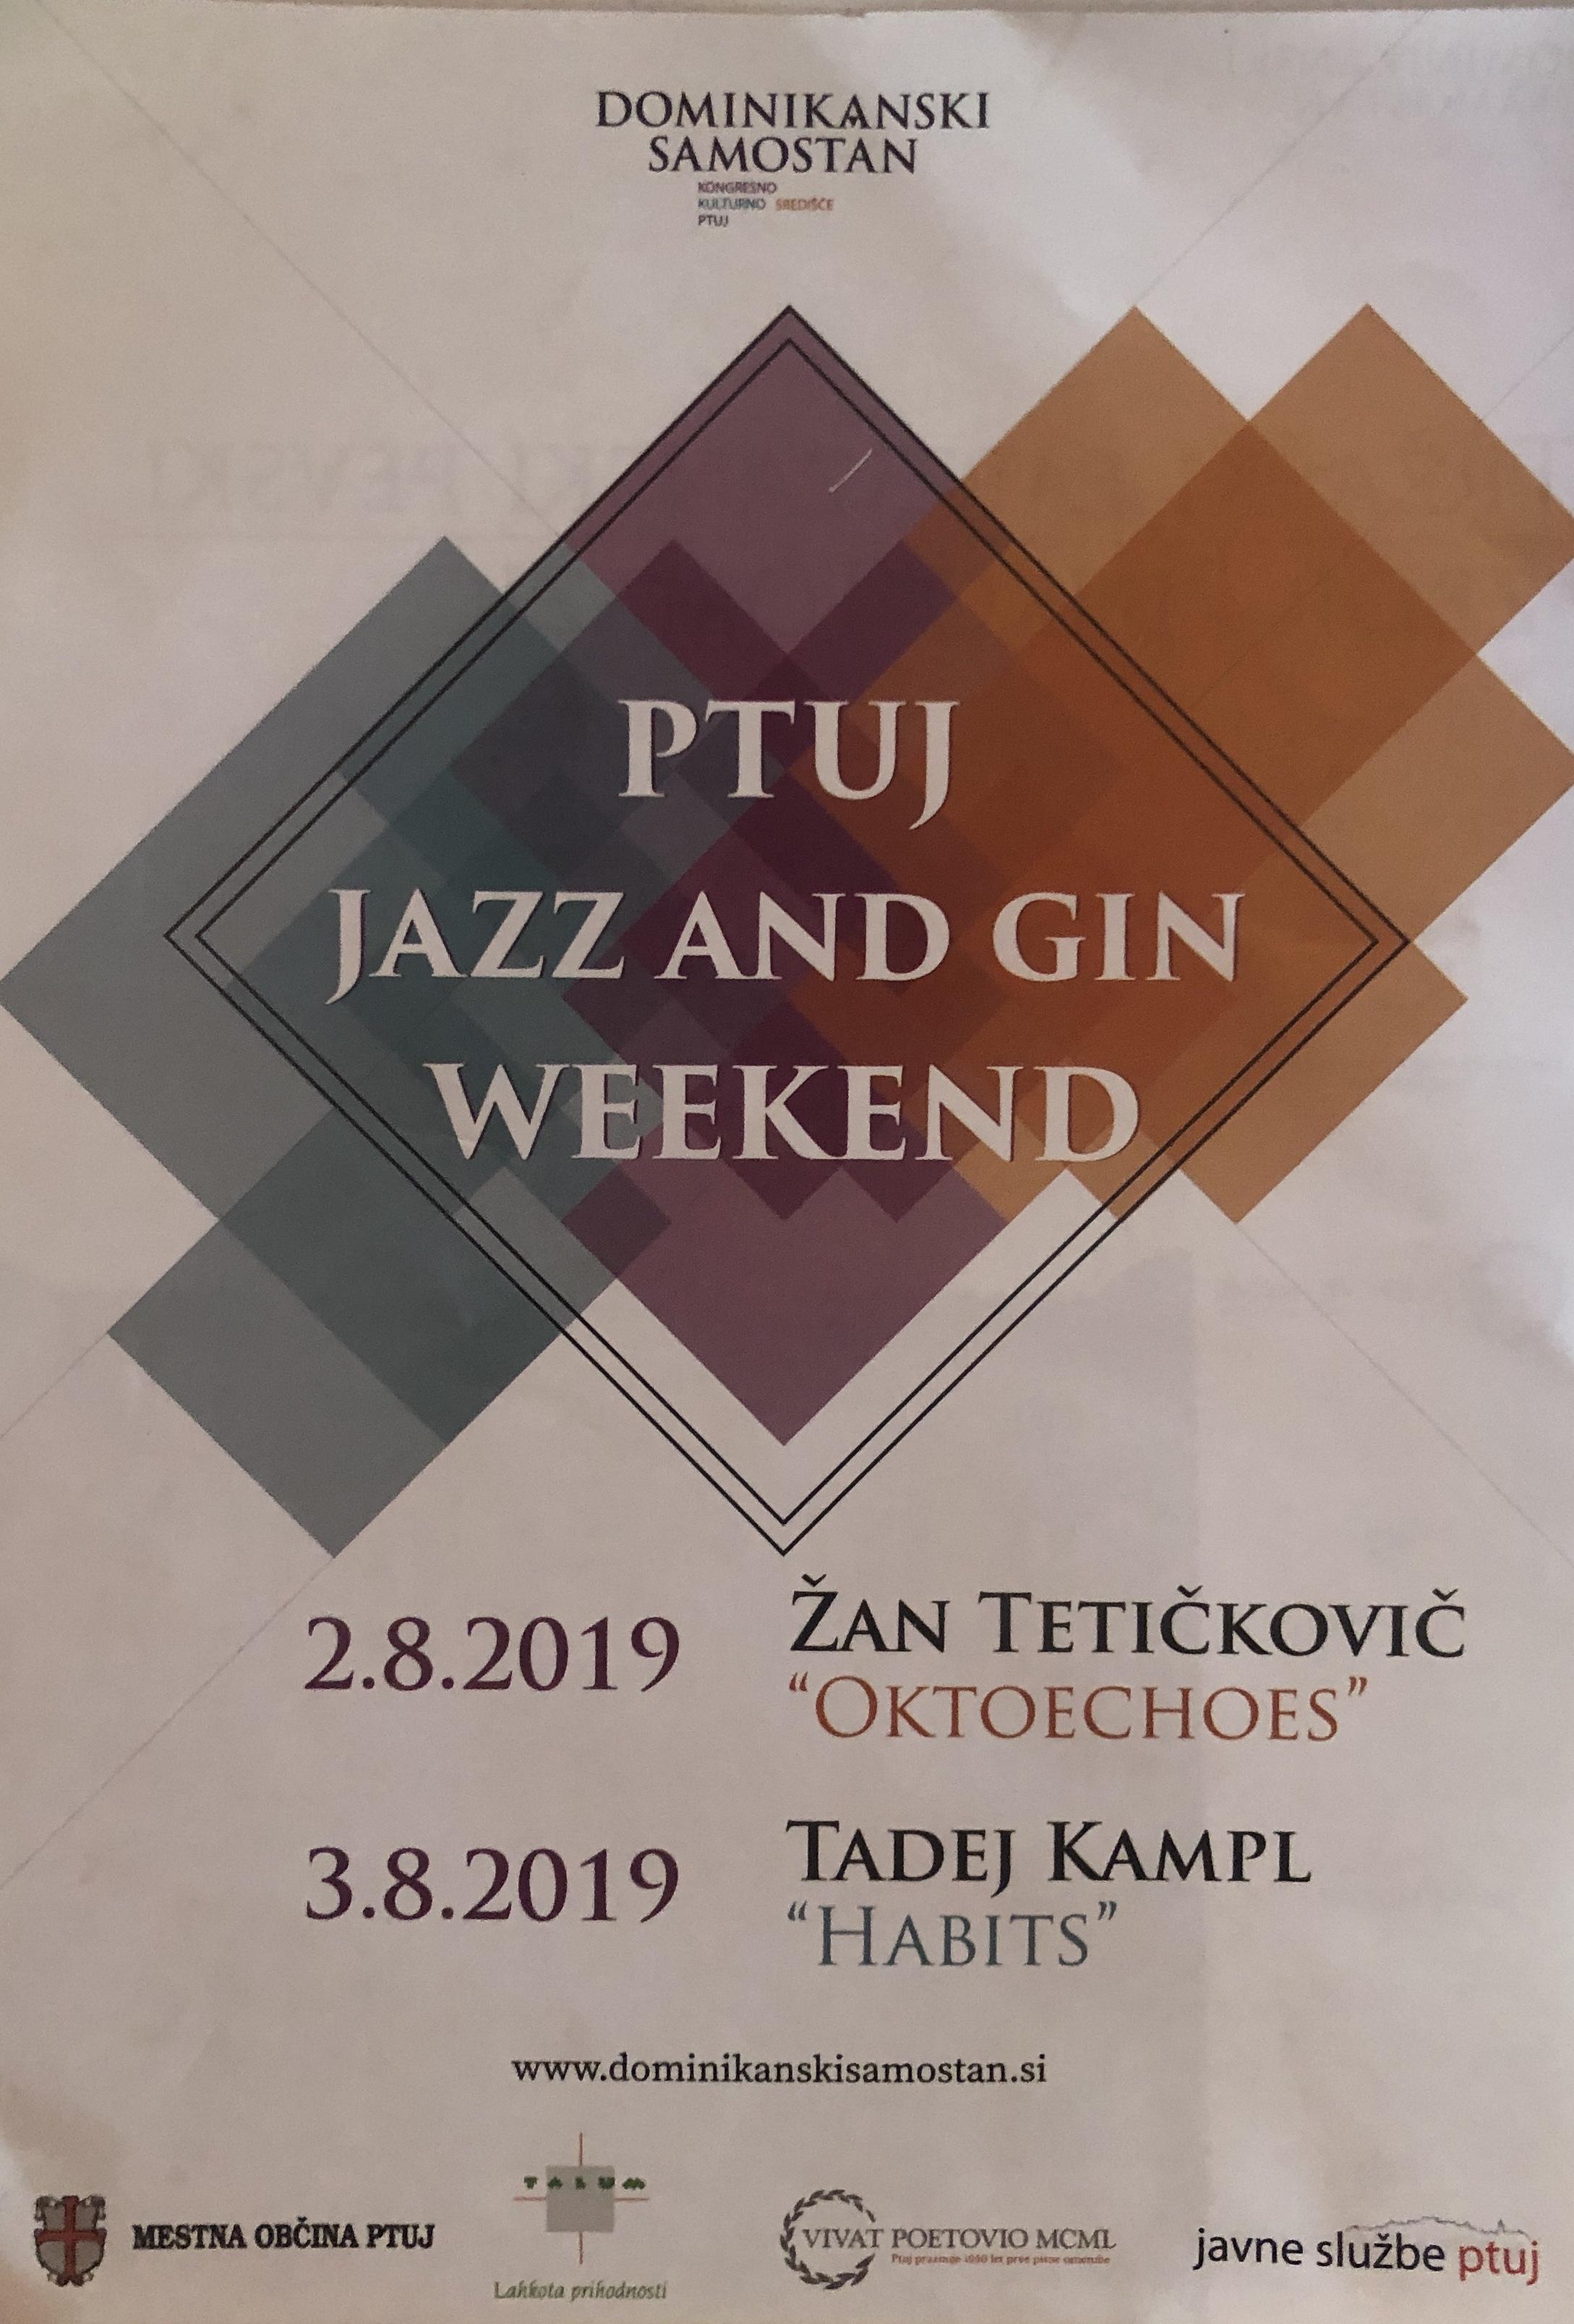 Ptuj (Jazz & Gin Weekend) - August 2nd 2019.jpg